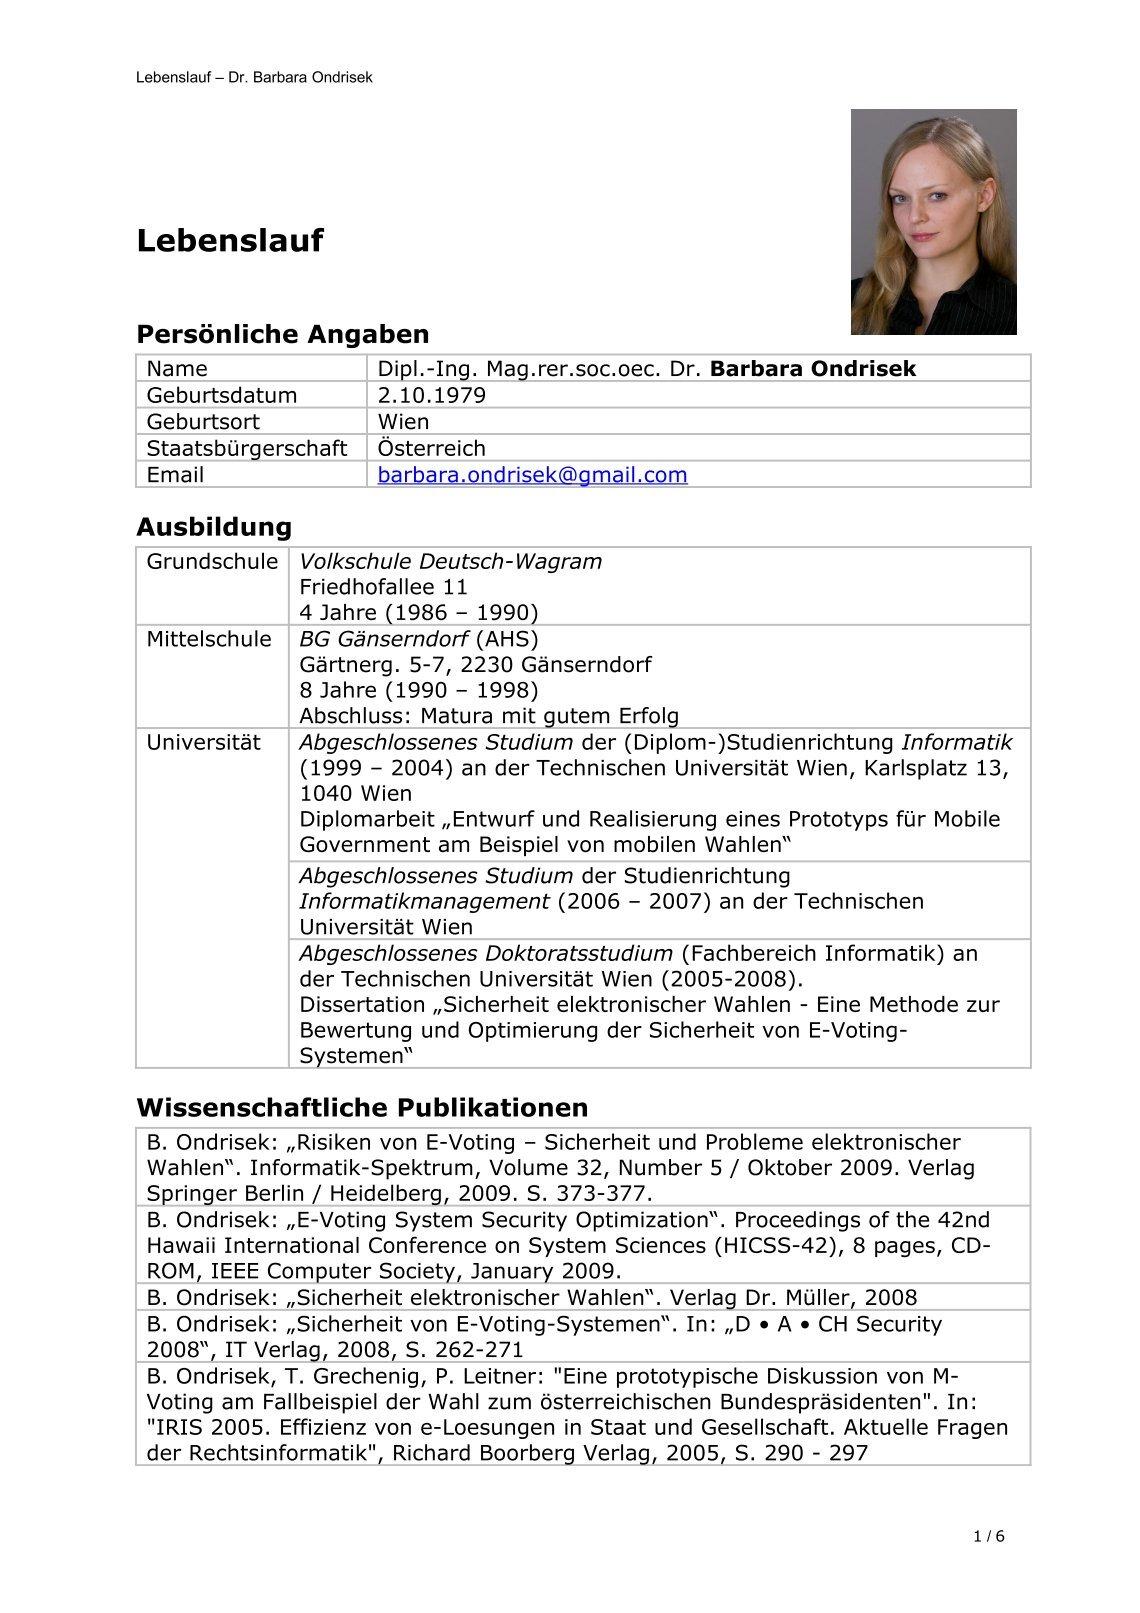 Großartig Arzt Cv Lebenslauf Probe Bilder - Entry Level Resume ...